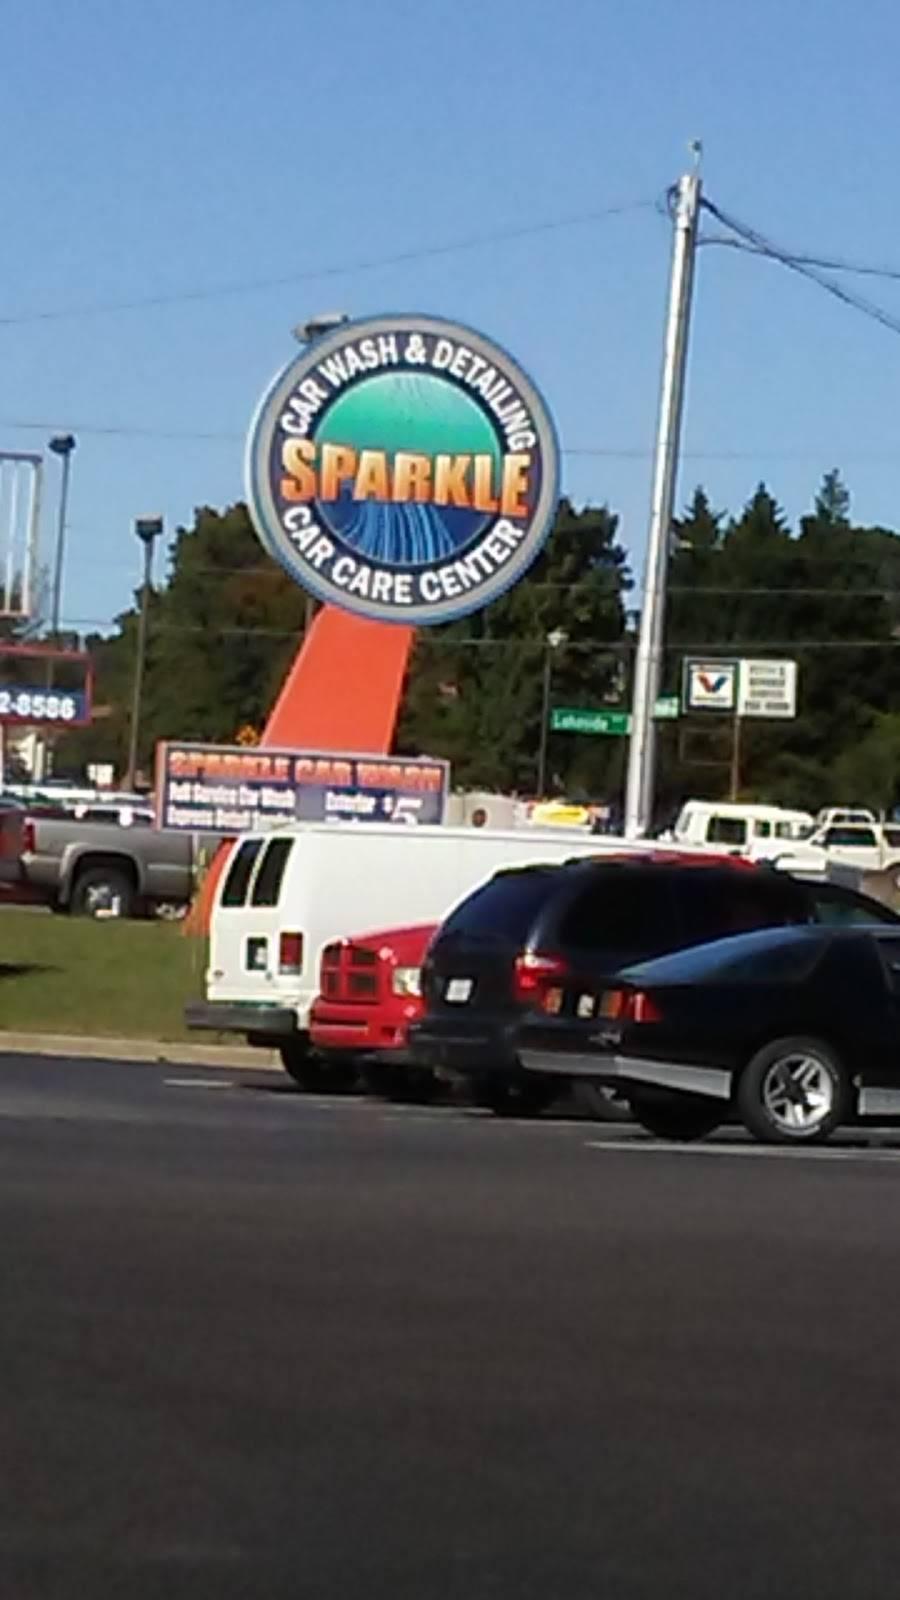 Sparkle Car Care - car wash  | Photo 6 of 9 | Address: 7220 Brook Rd, Richmond, VA 23227, USA | Phone: (804) 262-7300